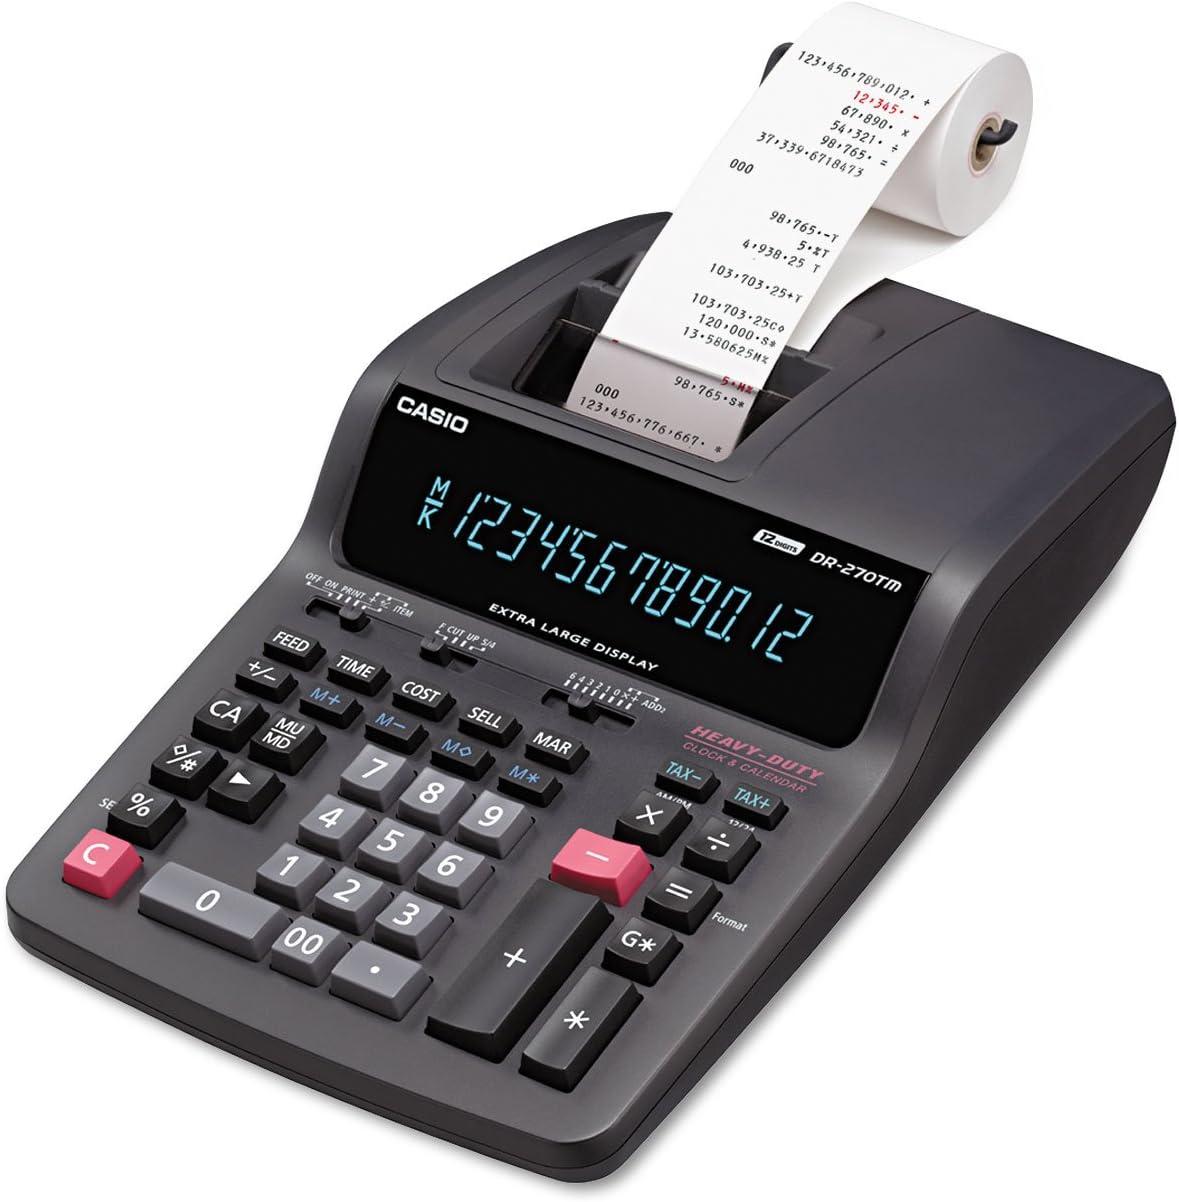 CSODR270TM - DR-270TM Two-Color Desktop Calculator